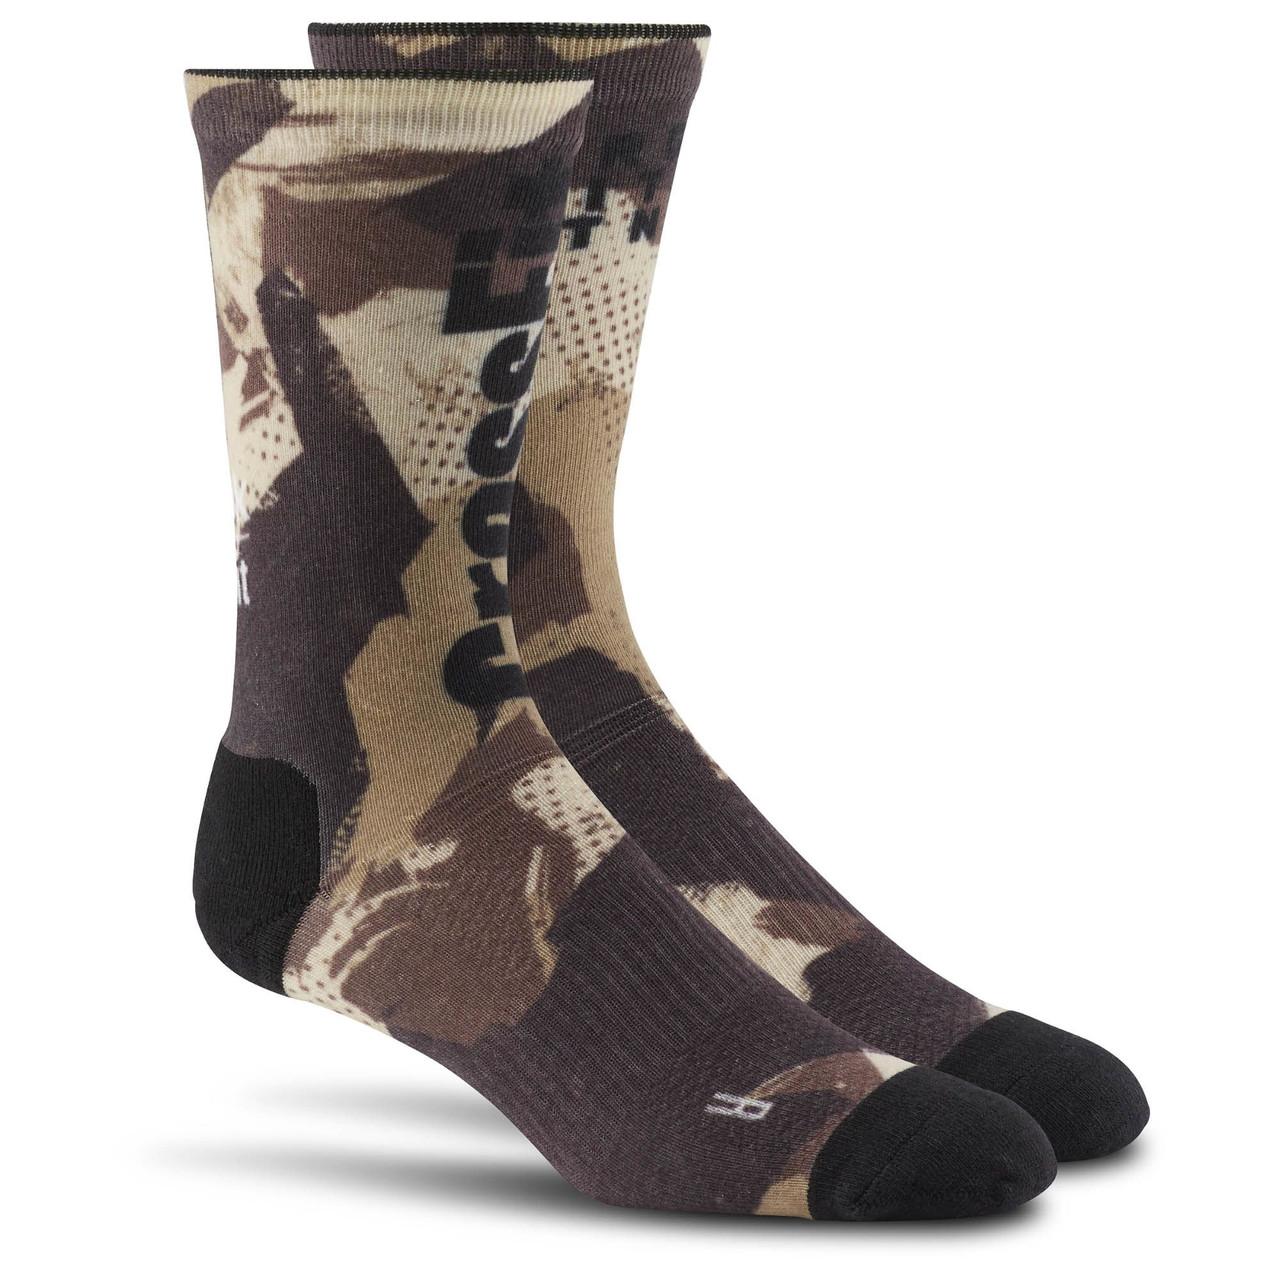 Мужские носки Reebok Crossfit Men Camo Crew (Артикул: BP9154)